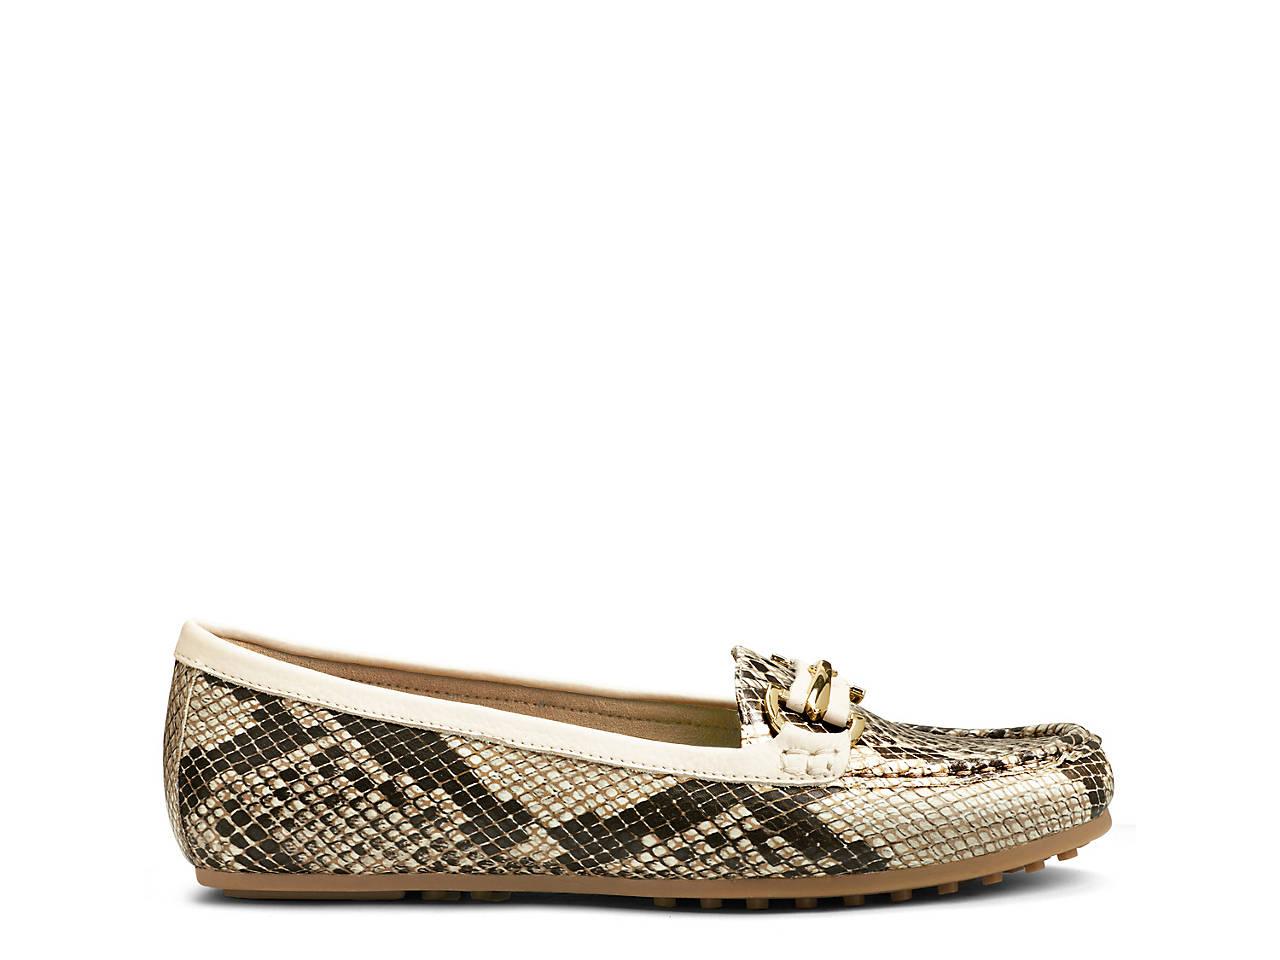 22f6af8410e Aerosoles Drive Along Loafer Women s Shoes